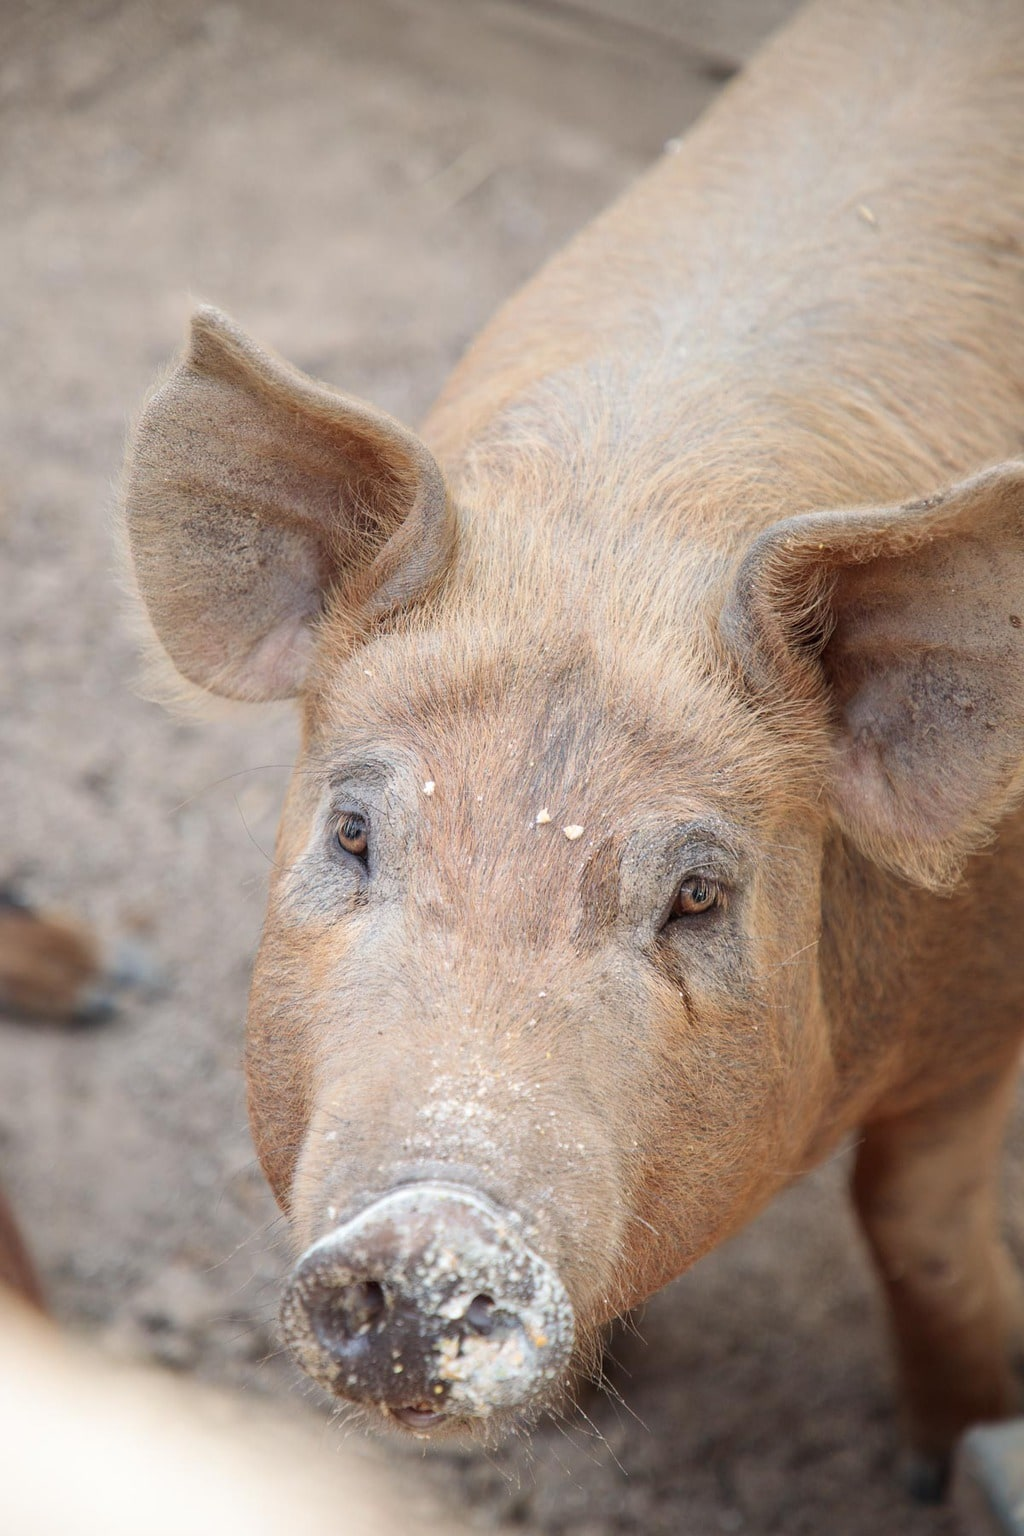 Closeup of a pig from Ballymaloe Farms.